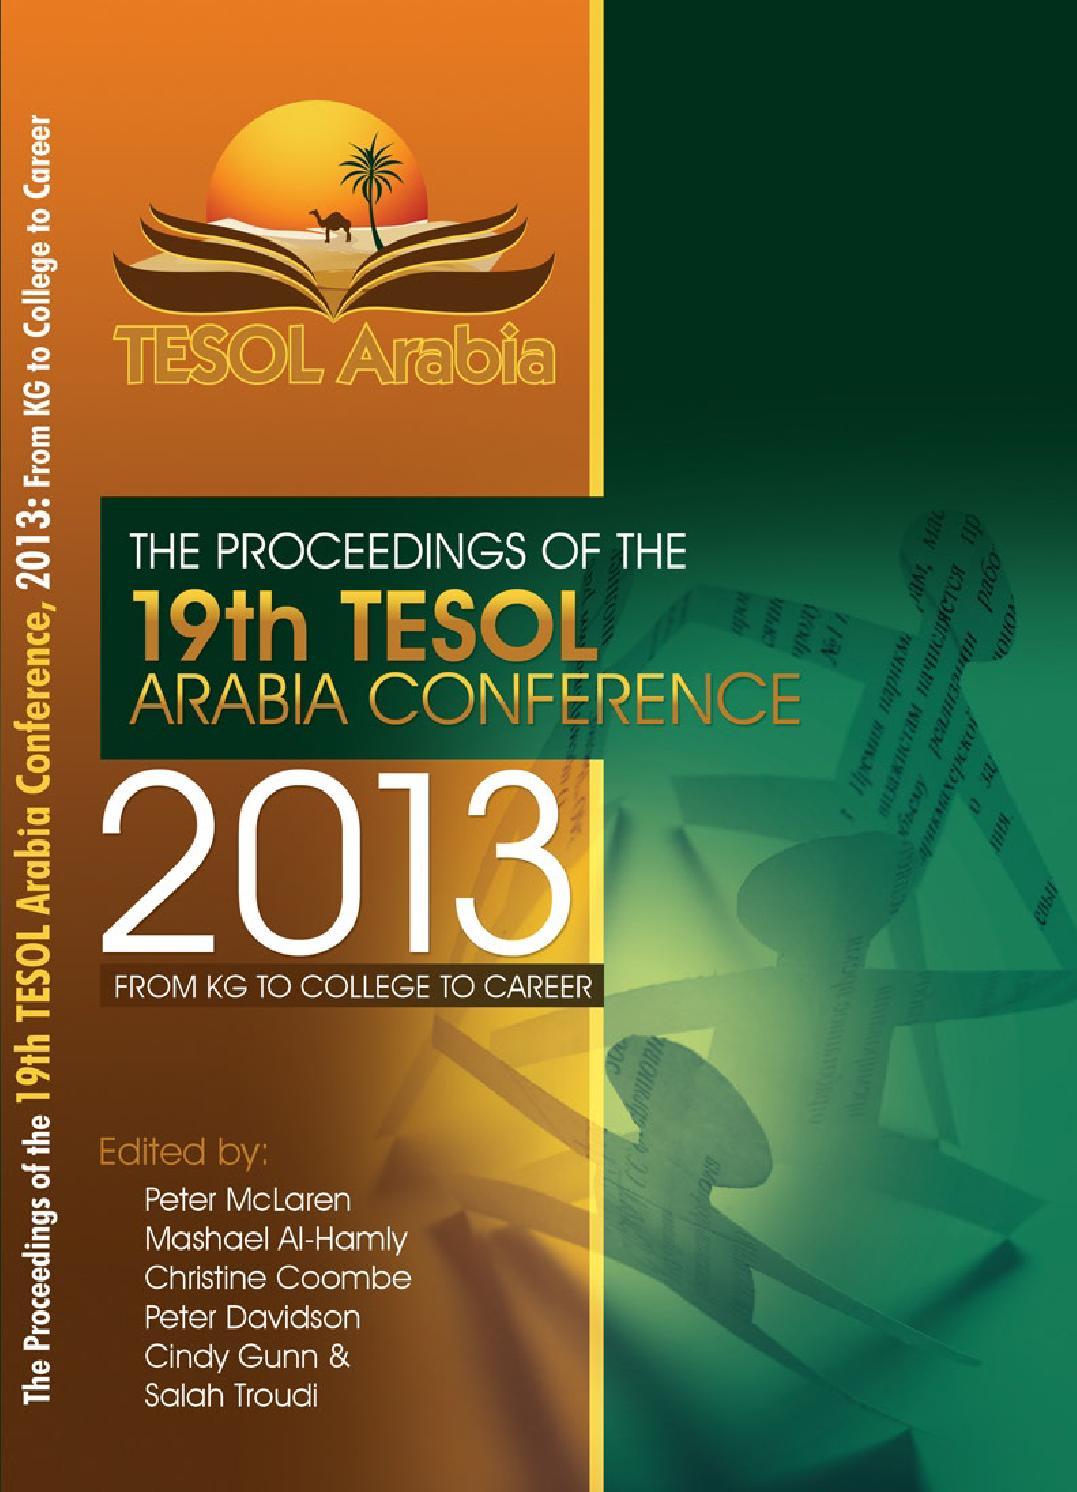 tacon 2013 proceedings by tesol arabia perspectives issuu